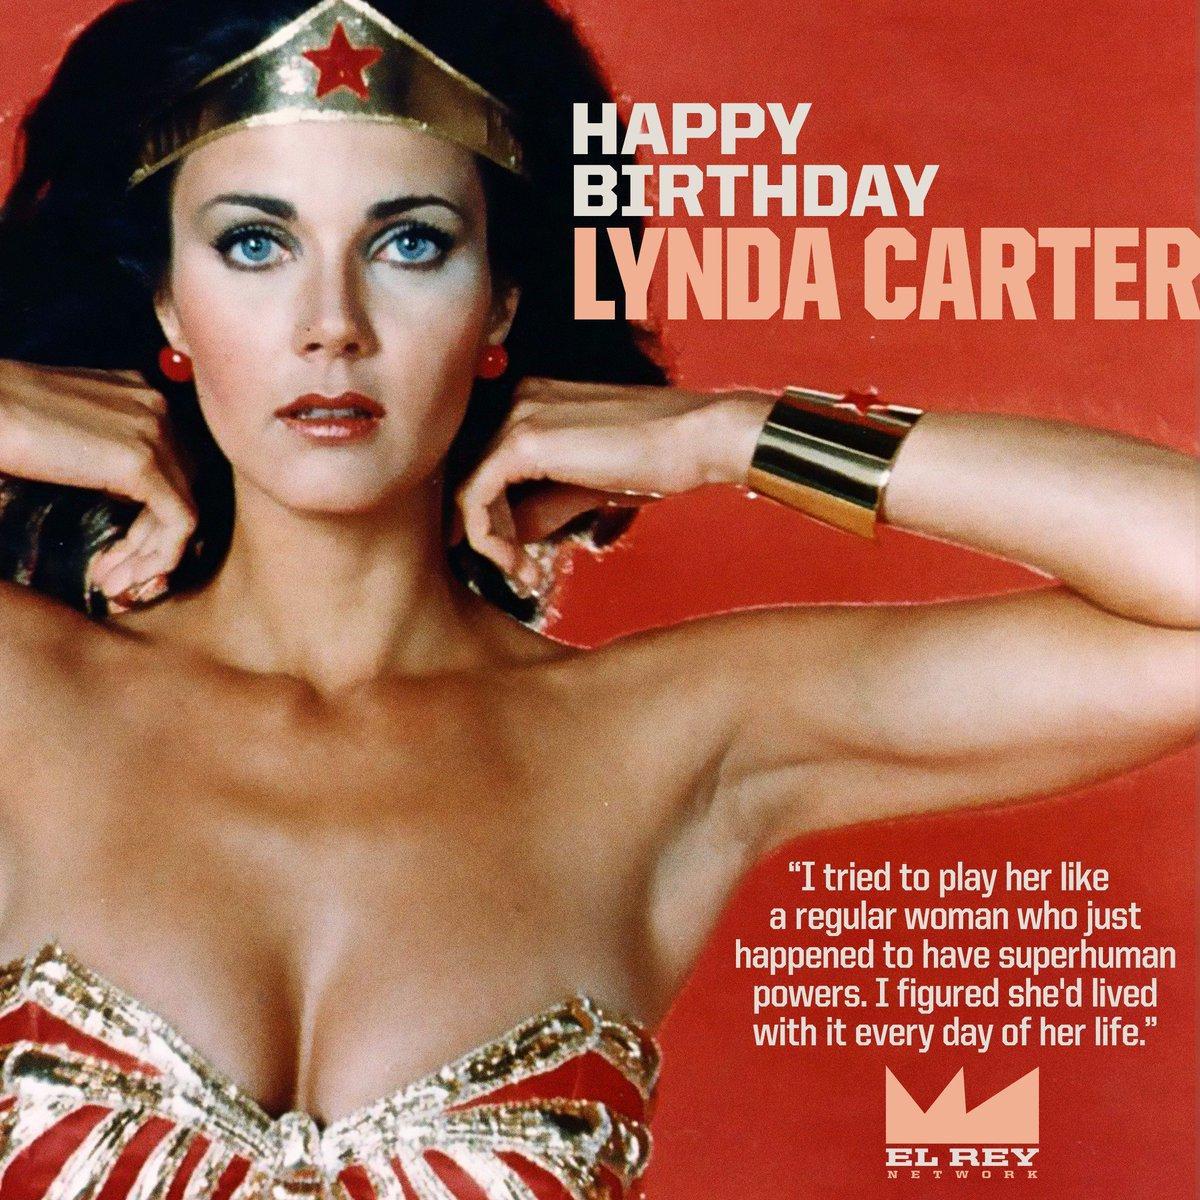 Happy Birthday @RealLyndaCarter from @ElReyNetwork! #LyndaCarter #WonderWoman  #ElderScrolls #Superhero #Acting #TV #Movies #RideWithElRey<br>http://pic.twitter.com/2FtwIqillr